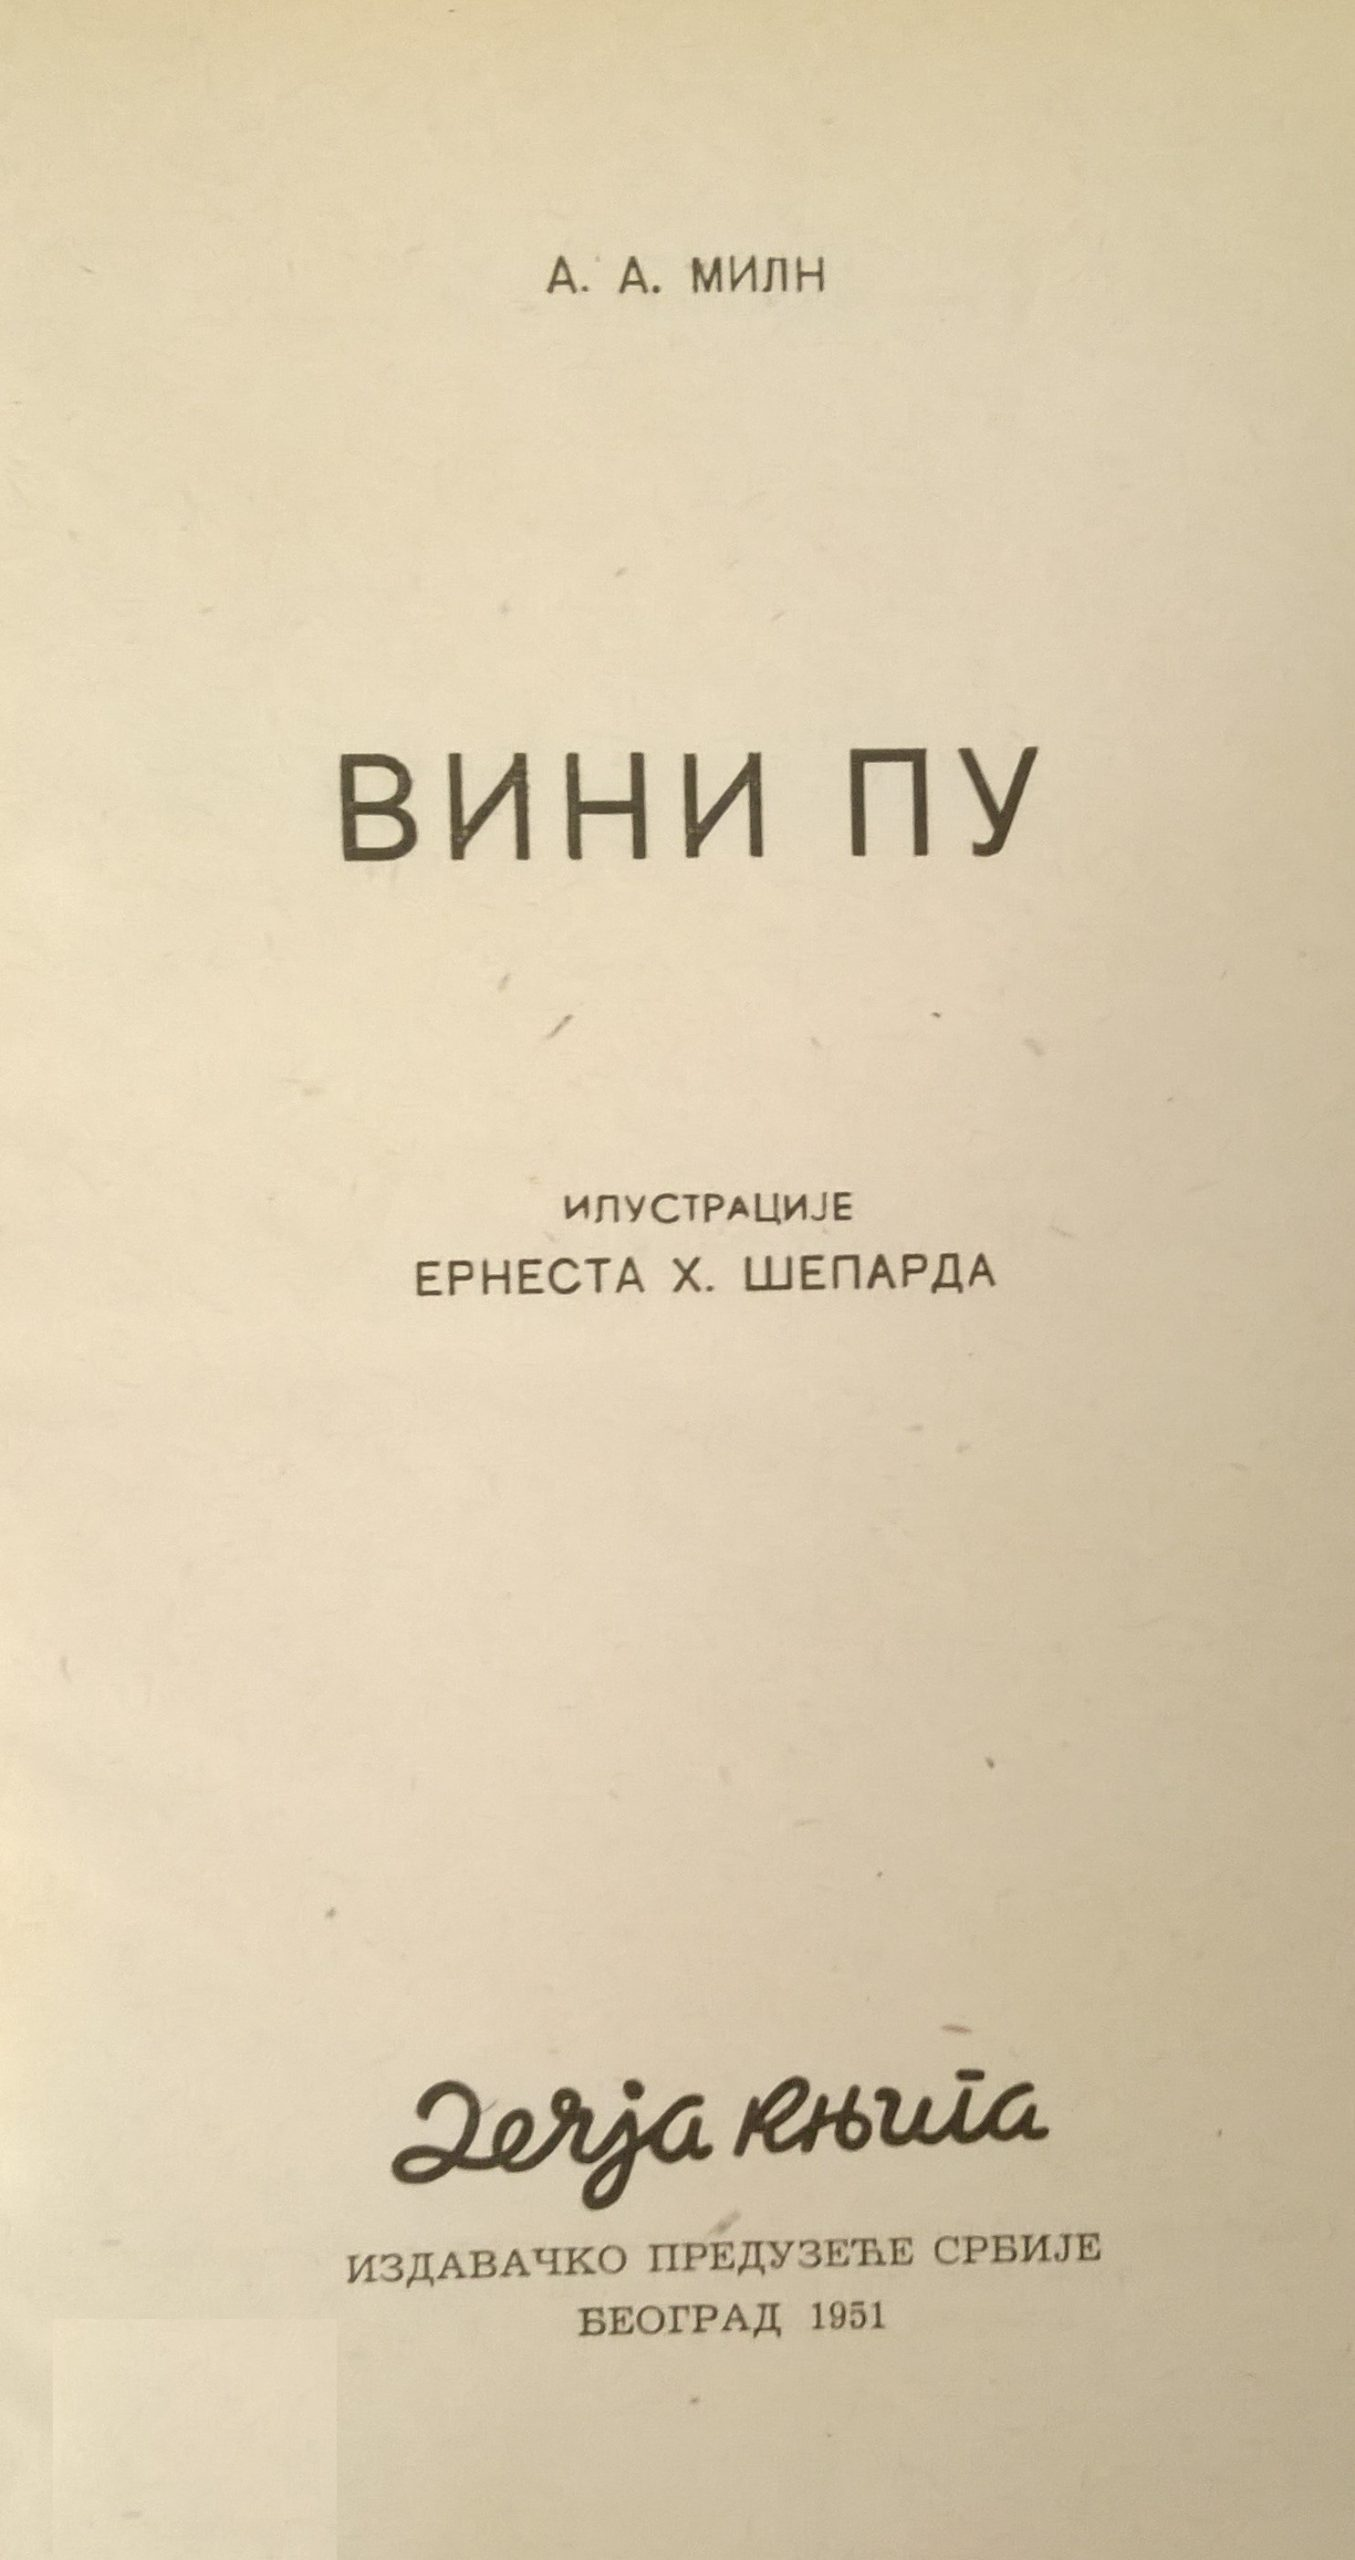 Vini Pu naslovna